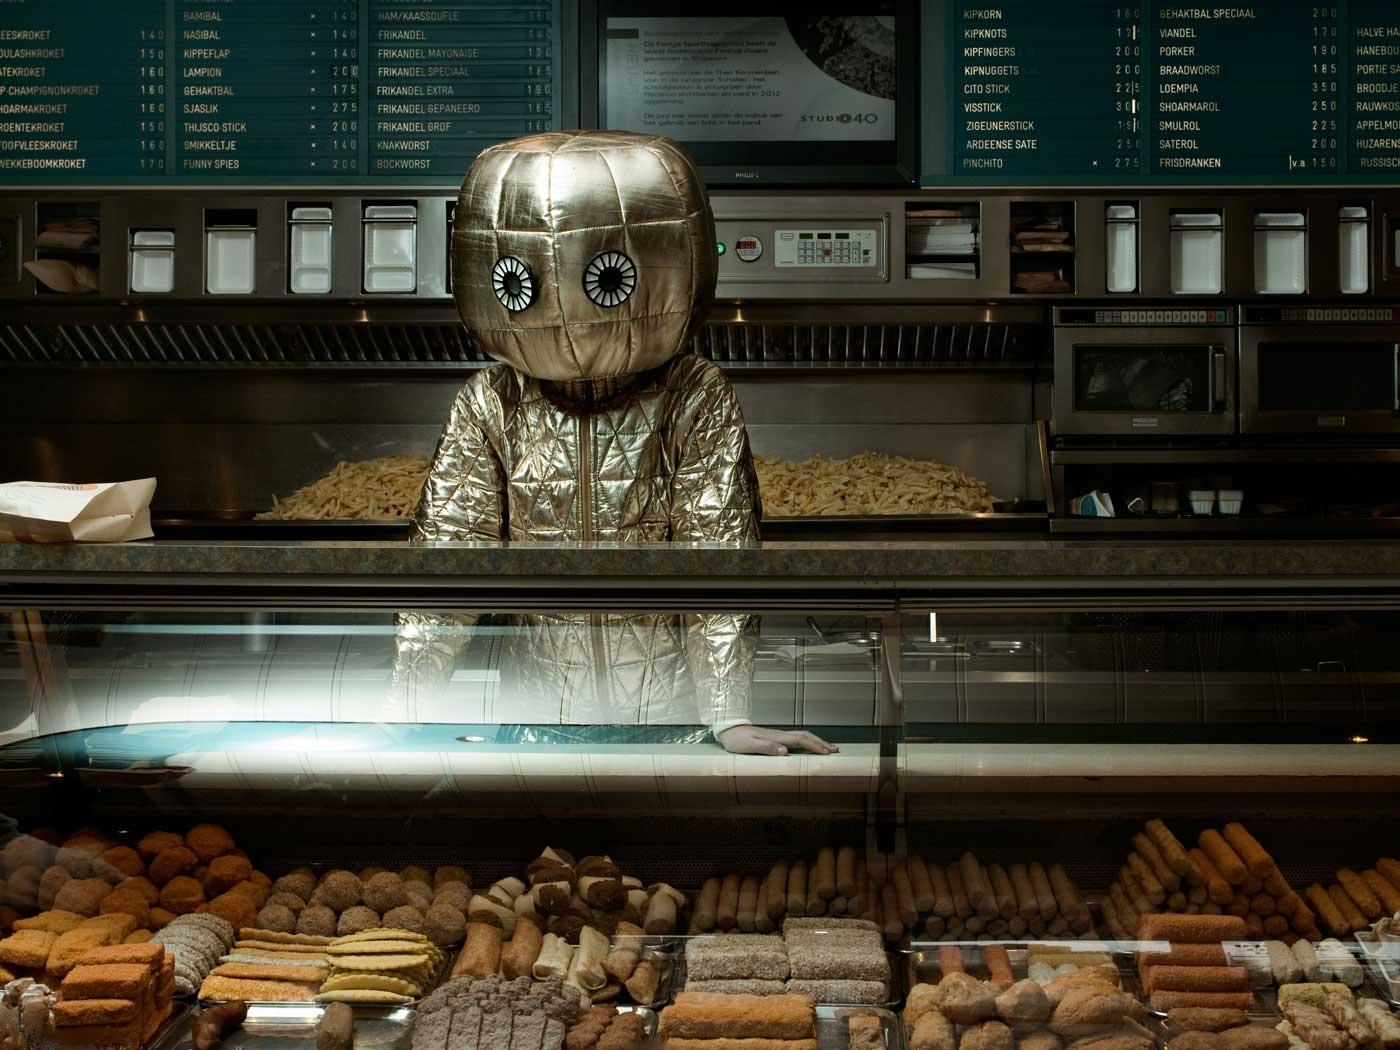 Snack, The Second Self Laboratory Jan Pieter Kaptein   Yellowtrace